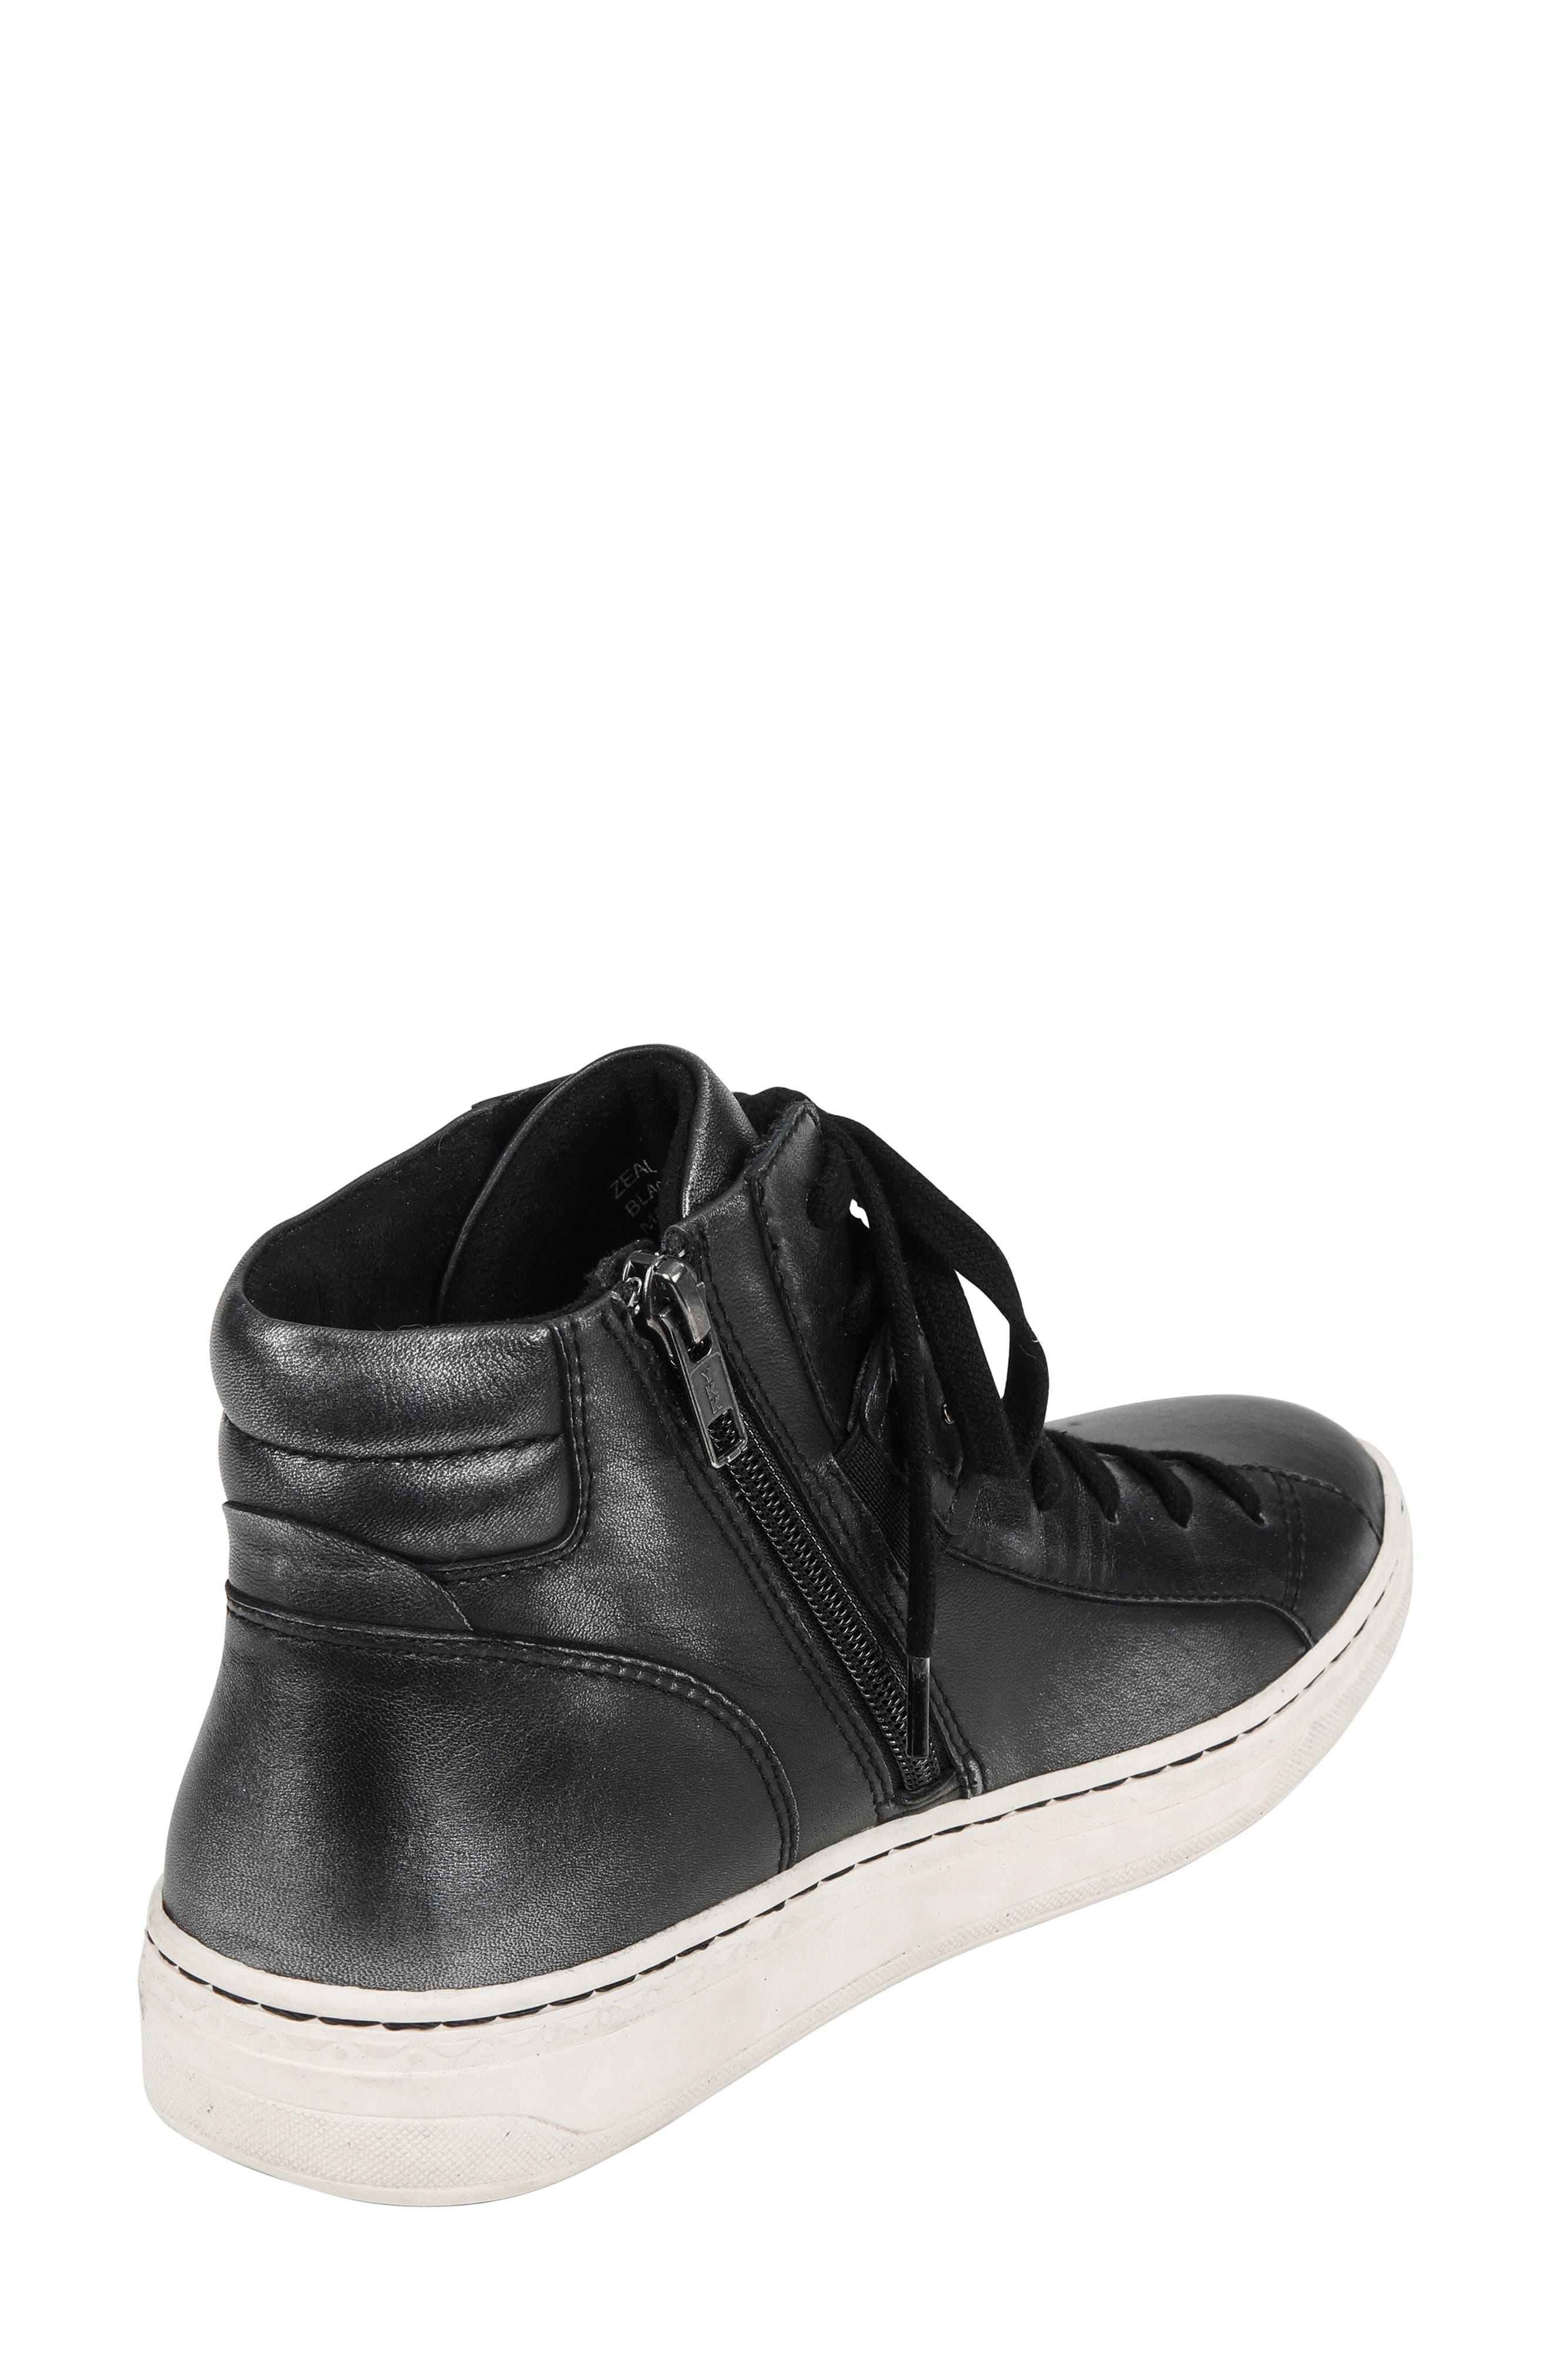 Zeal High Top Sneaker,                             Alternate thumbnail 2, color,                             BLACK METALLIC LEATHER